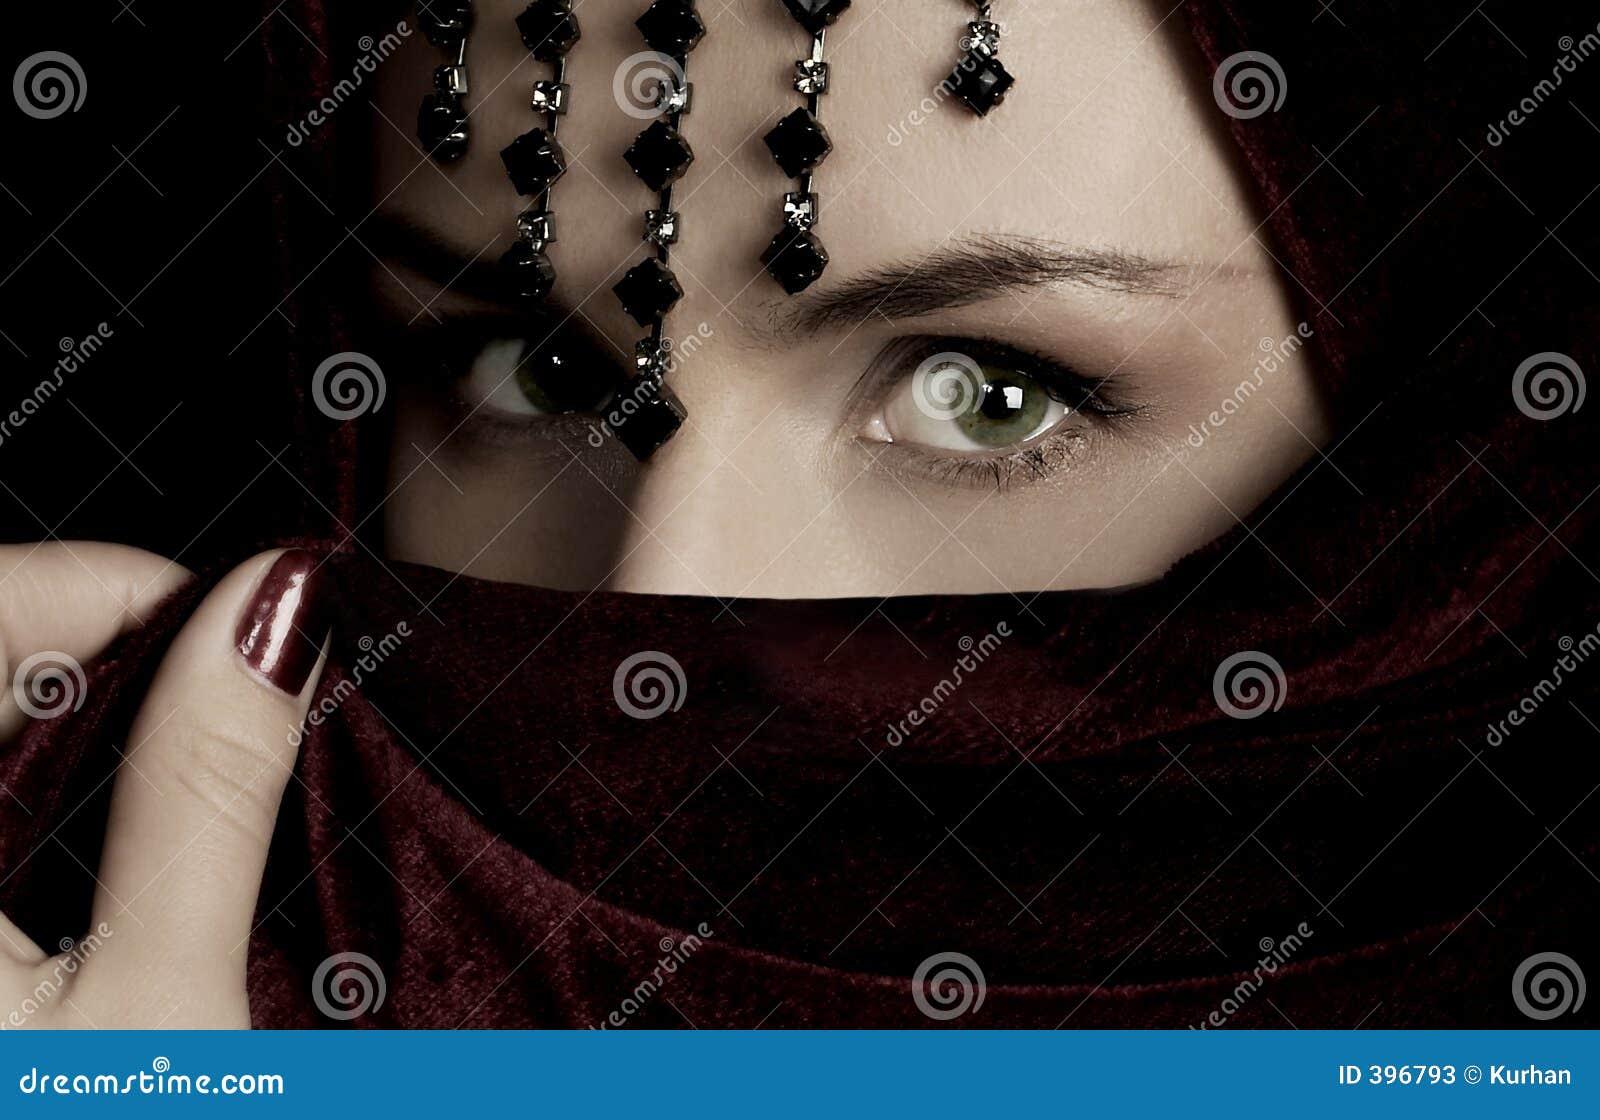 загадочная женщина